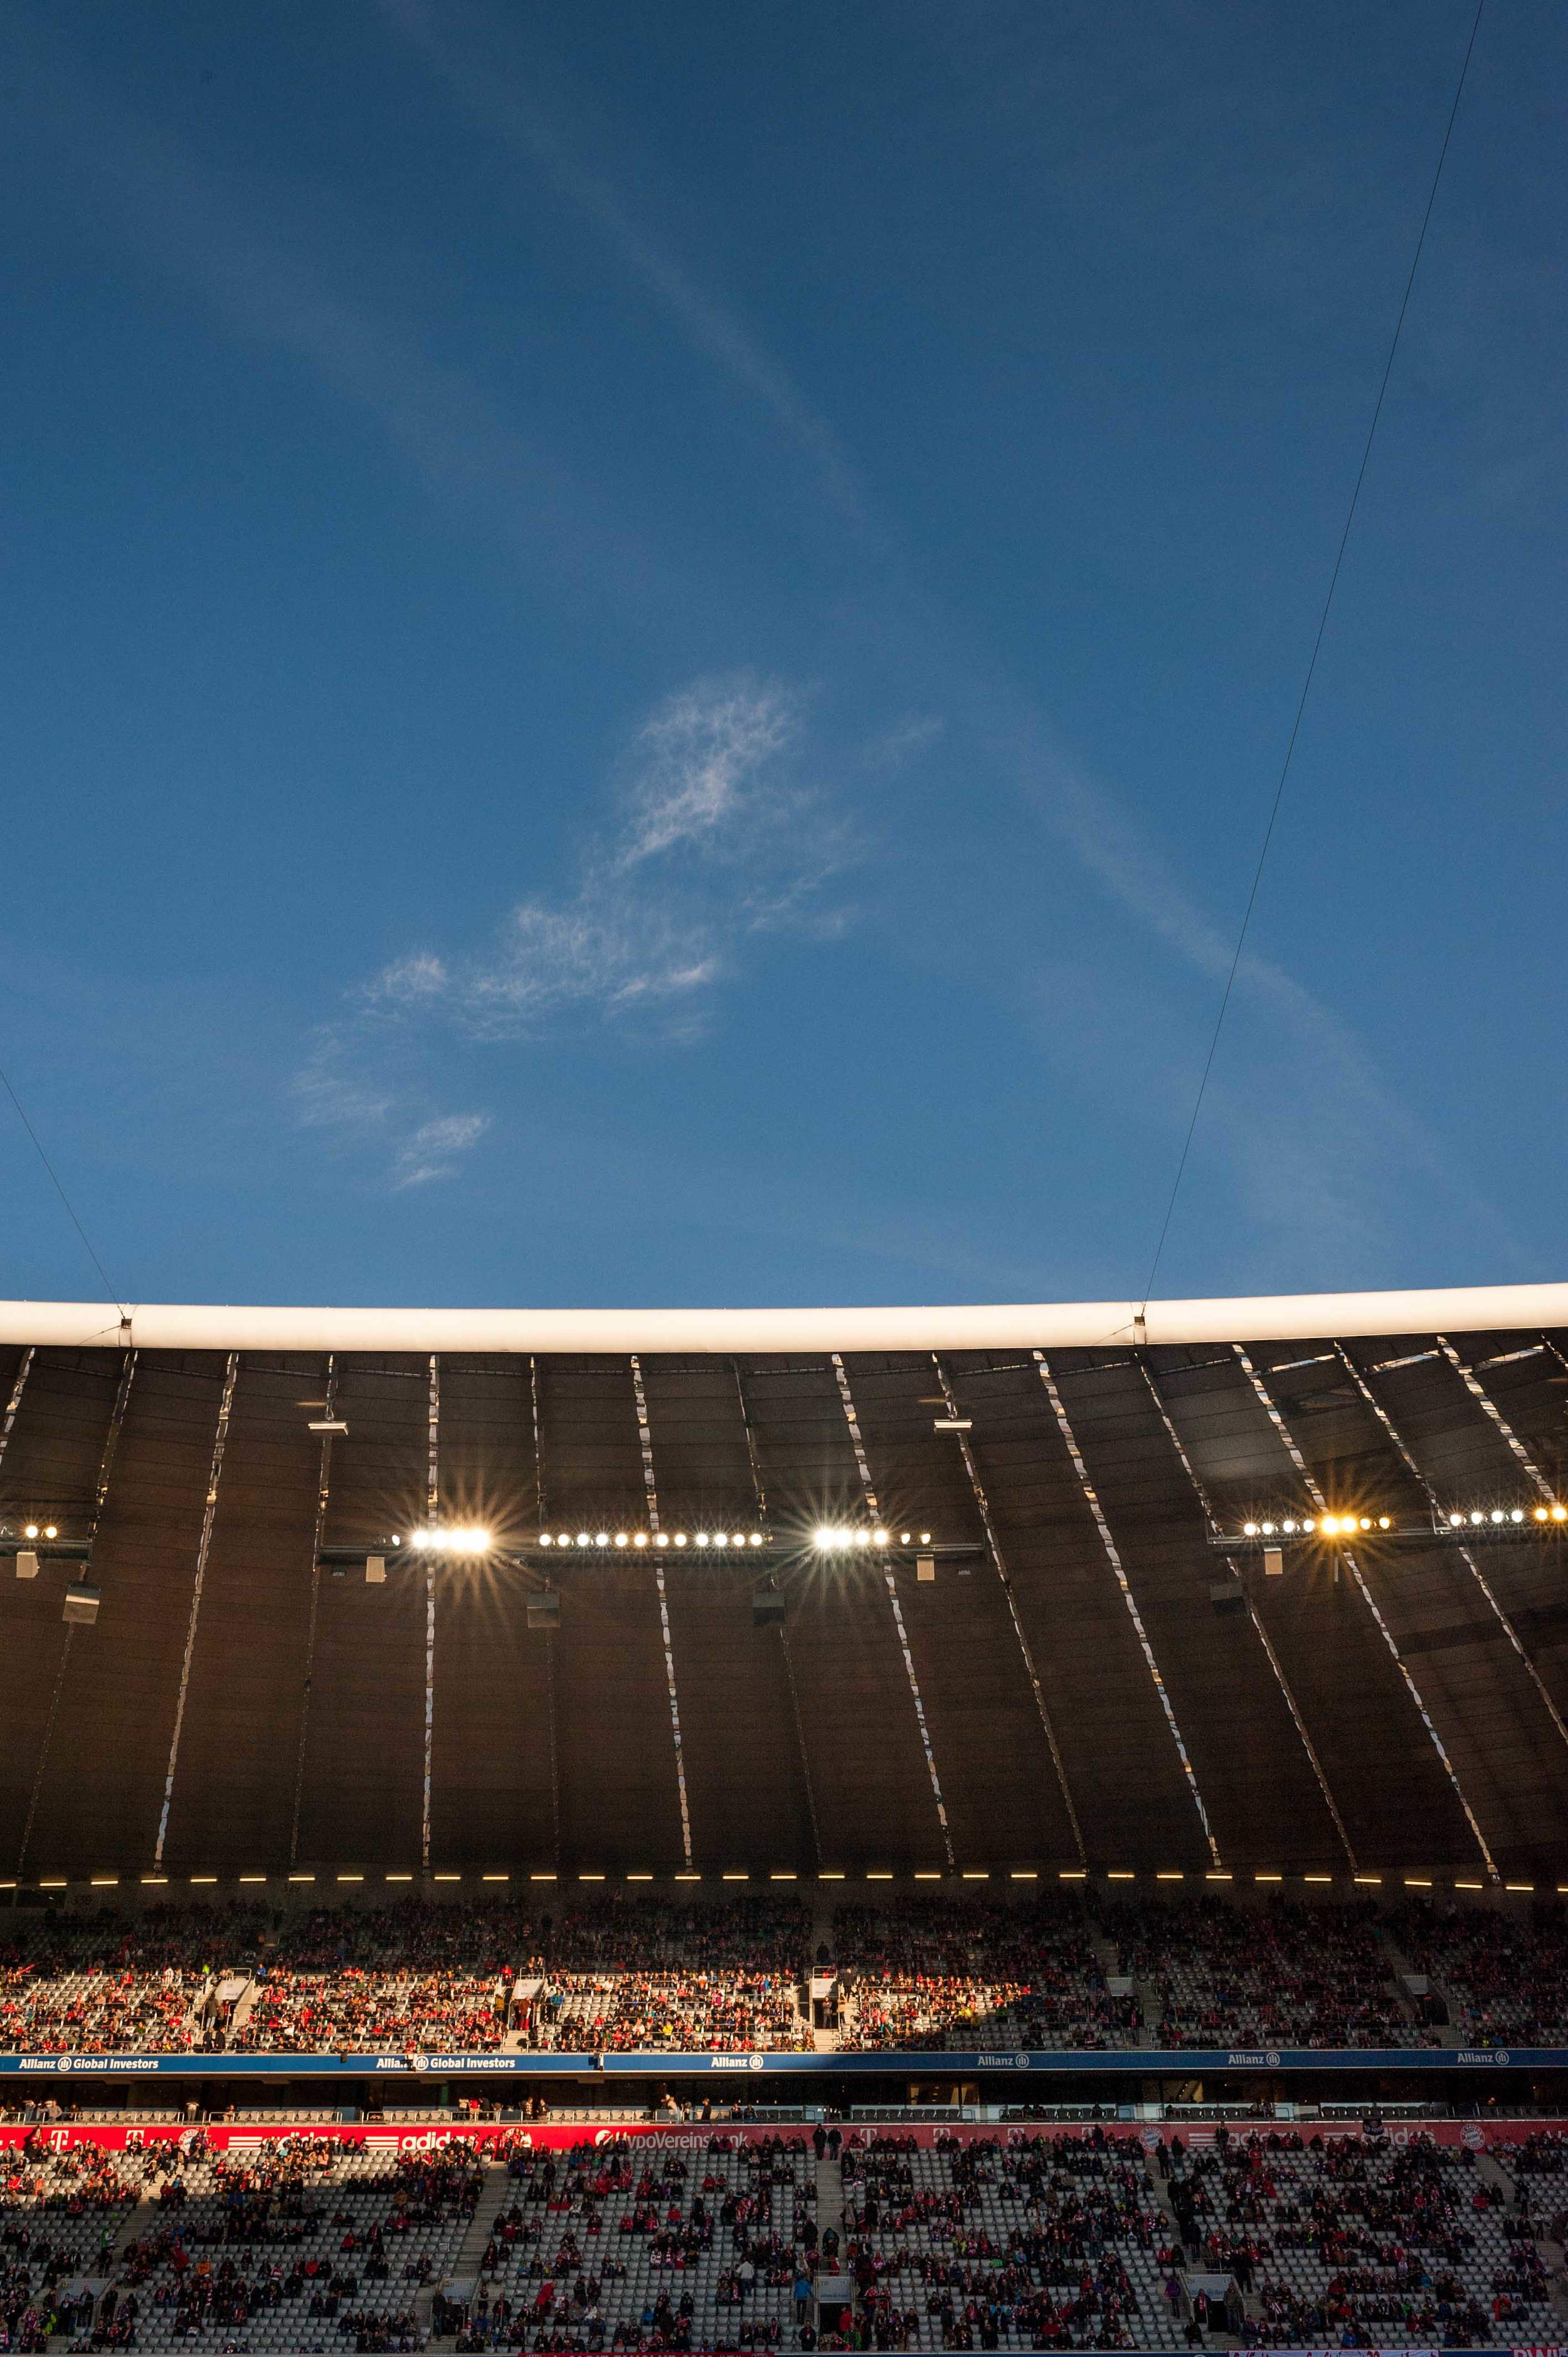 Stadion_FCB_vs_TSGH_22.11.2014_web-2.jpg